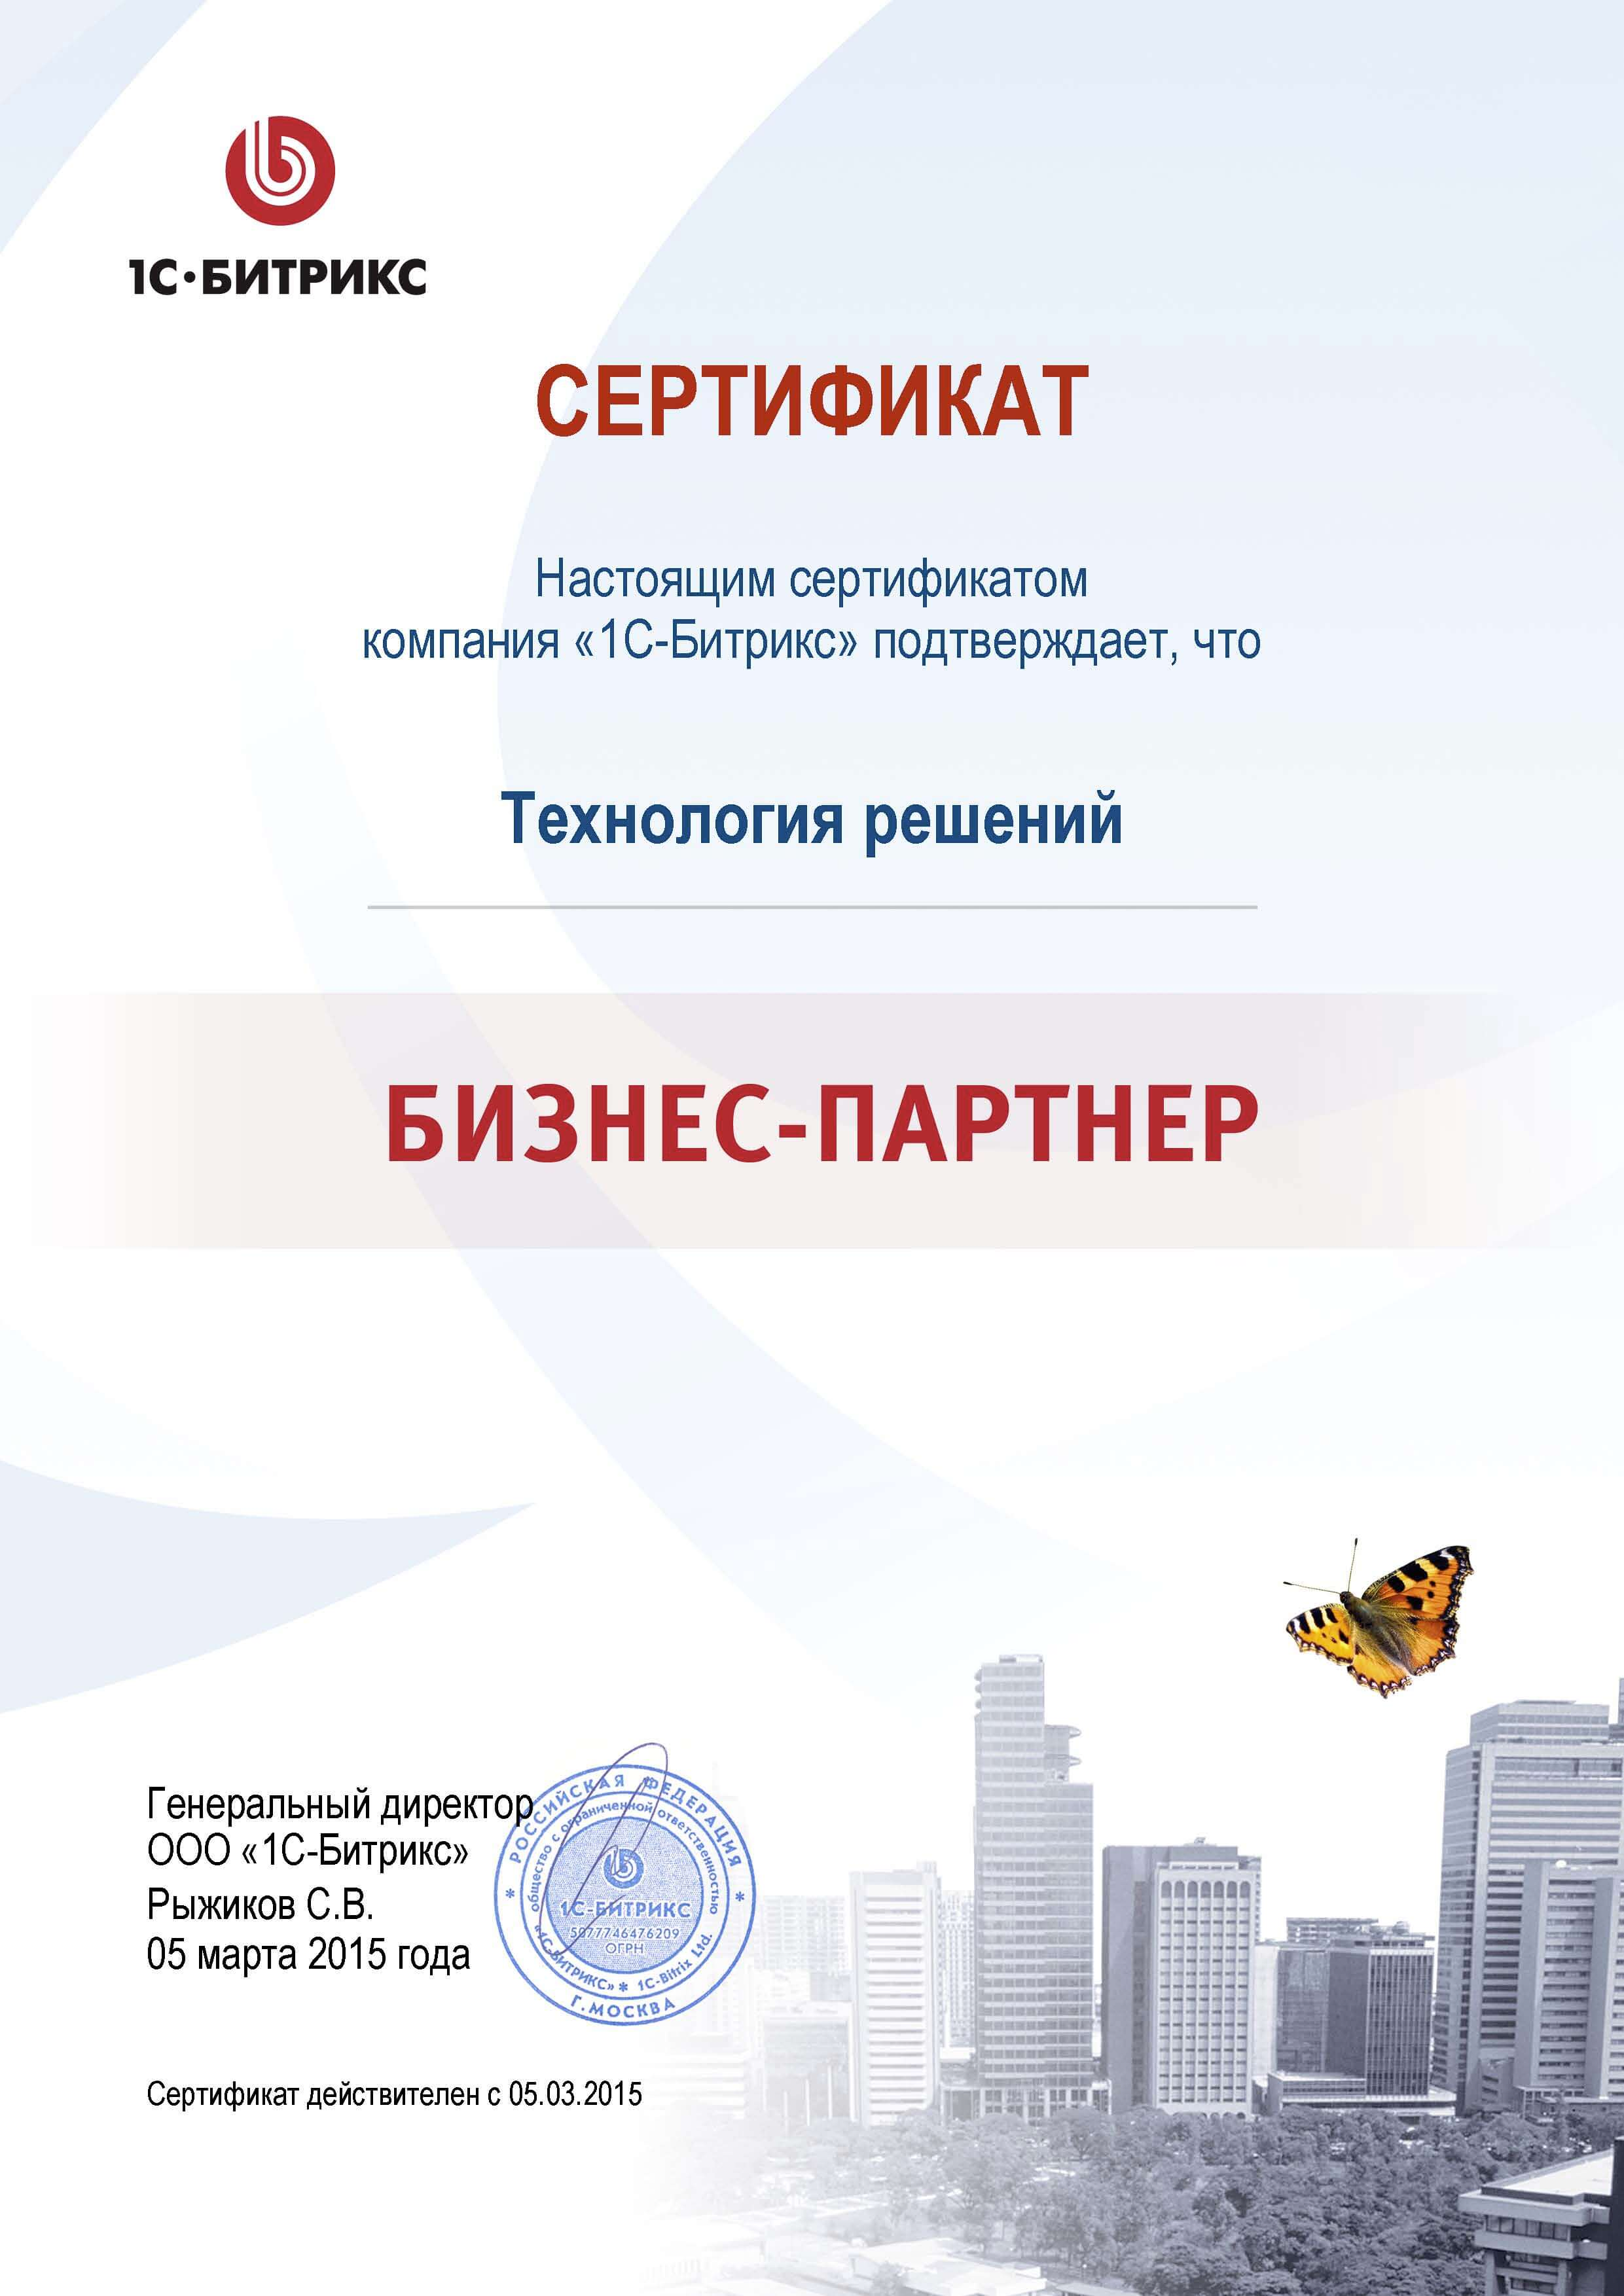 Сертификат Битрикс